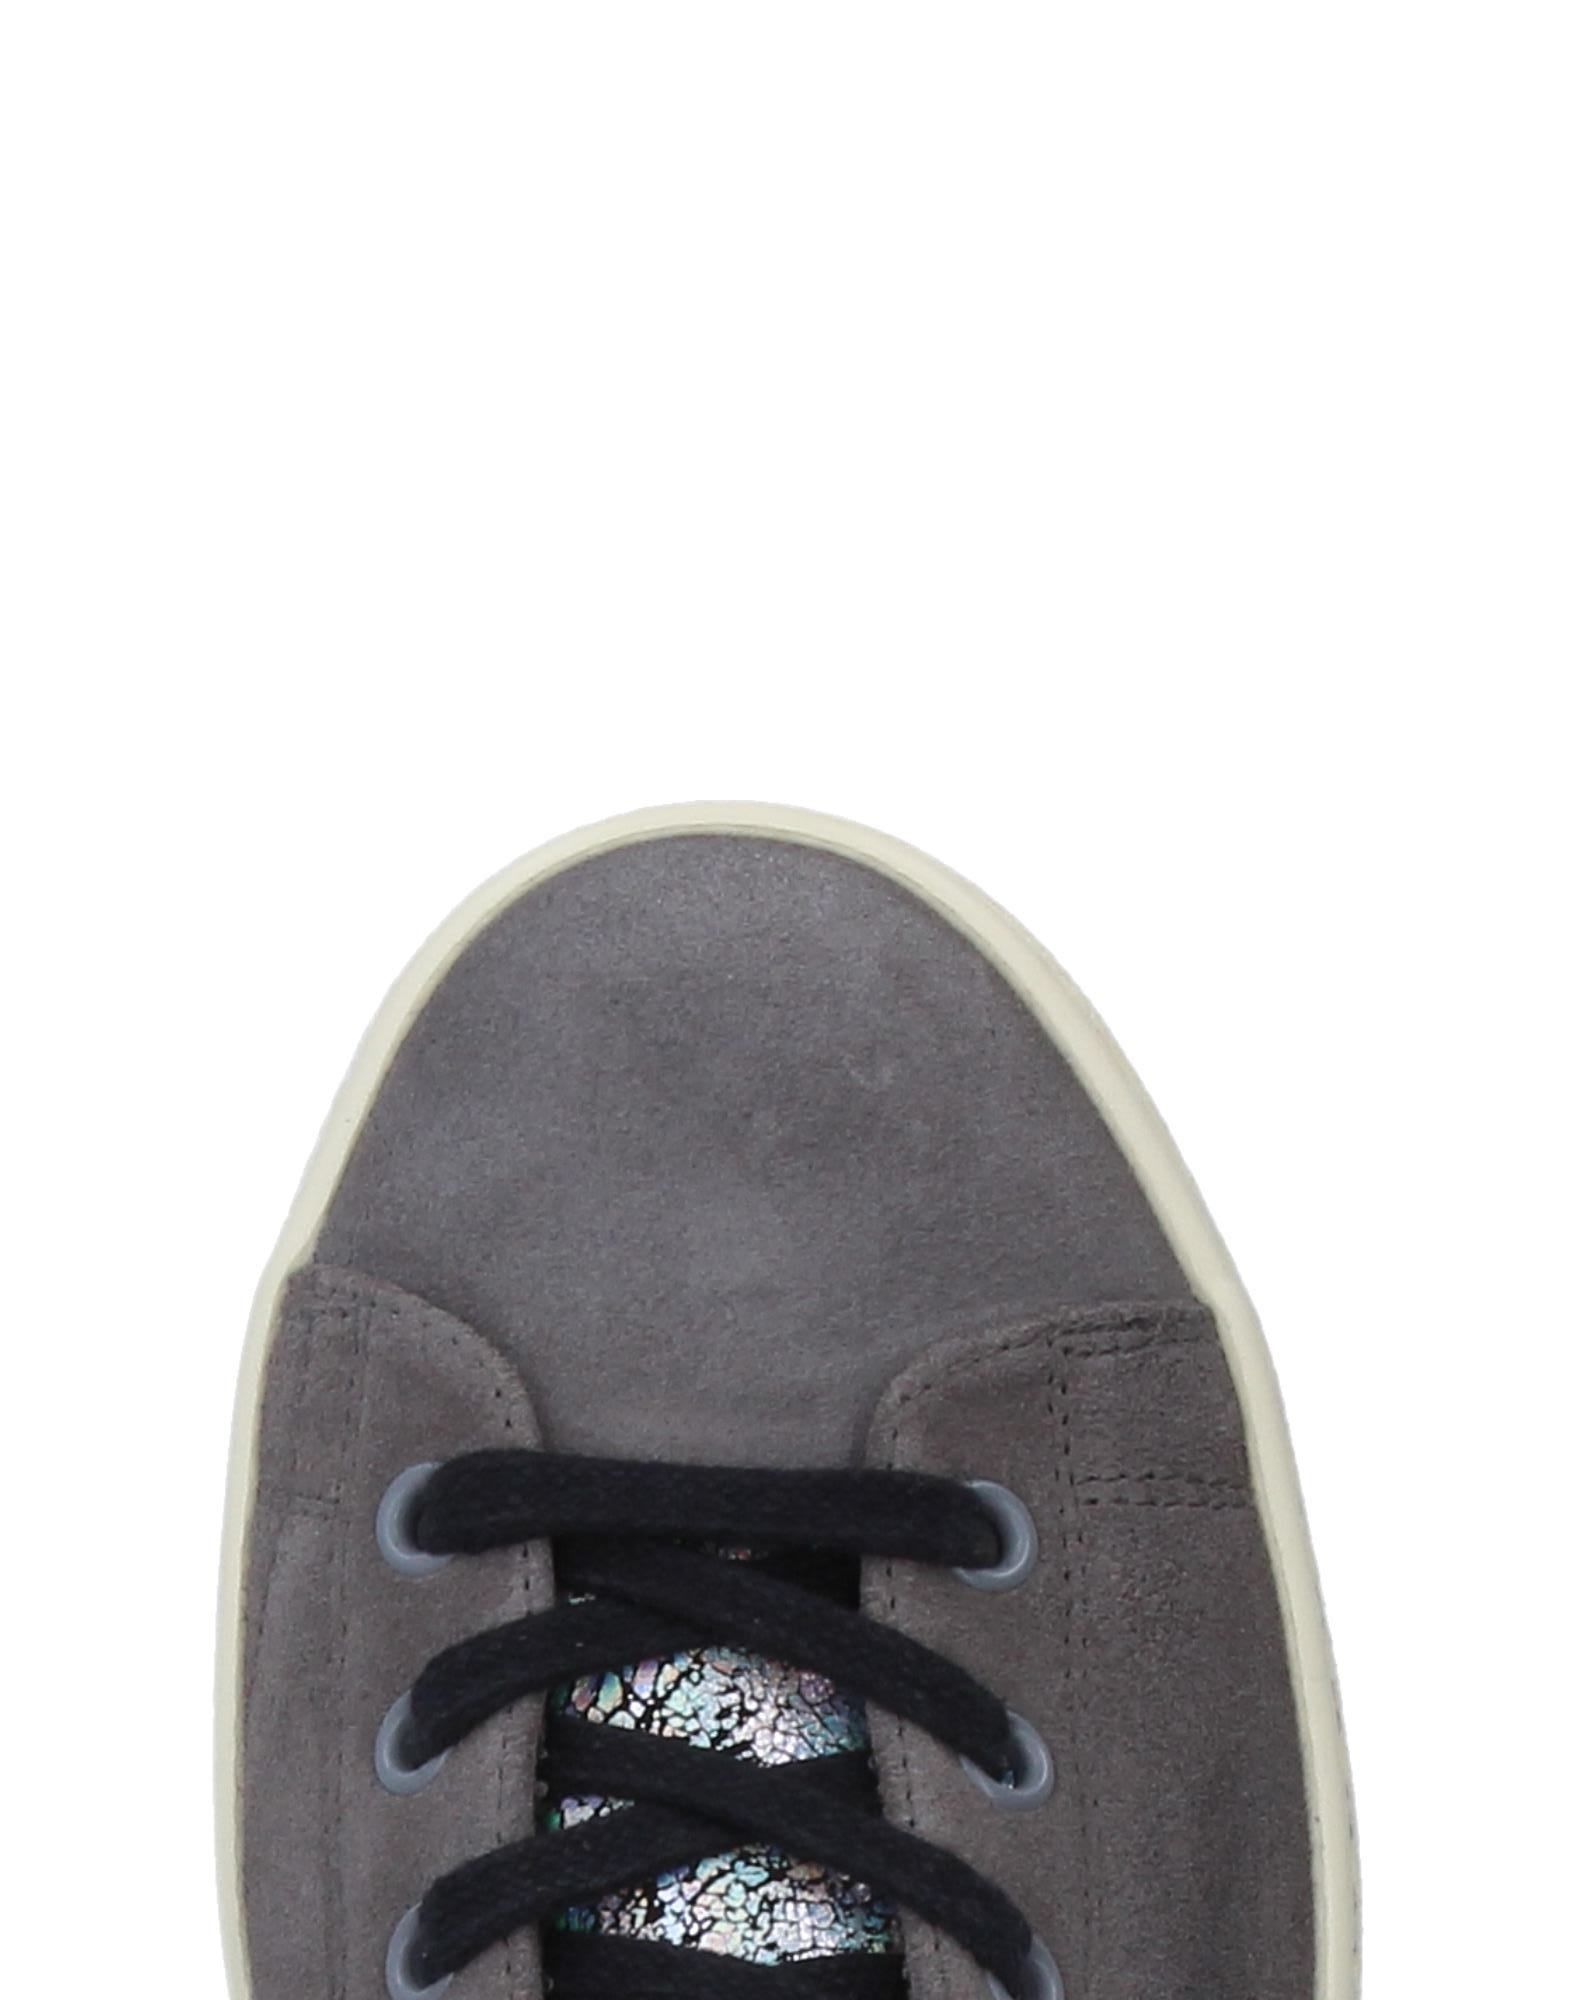 Leather Crown Sneakers Sneakers Sneakers - Women Leather Crown Sneakers online on  United Kingdom - 11262143GO 57e4f2